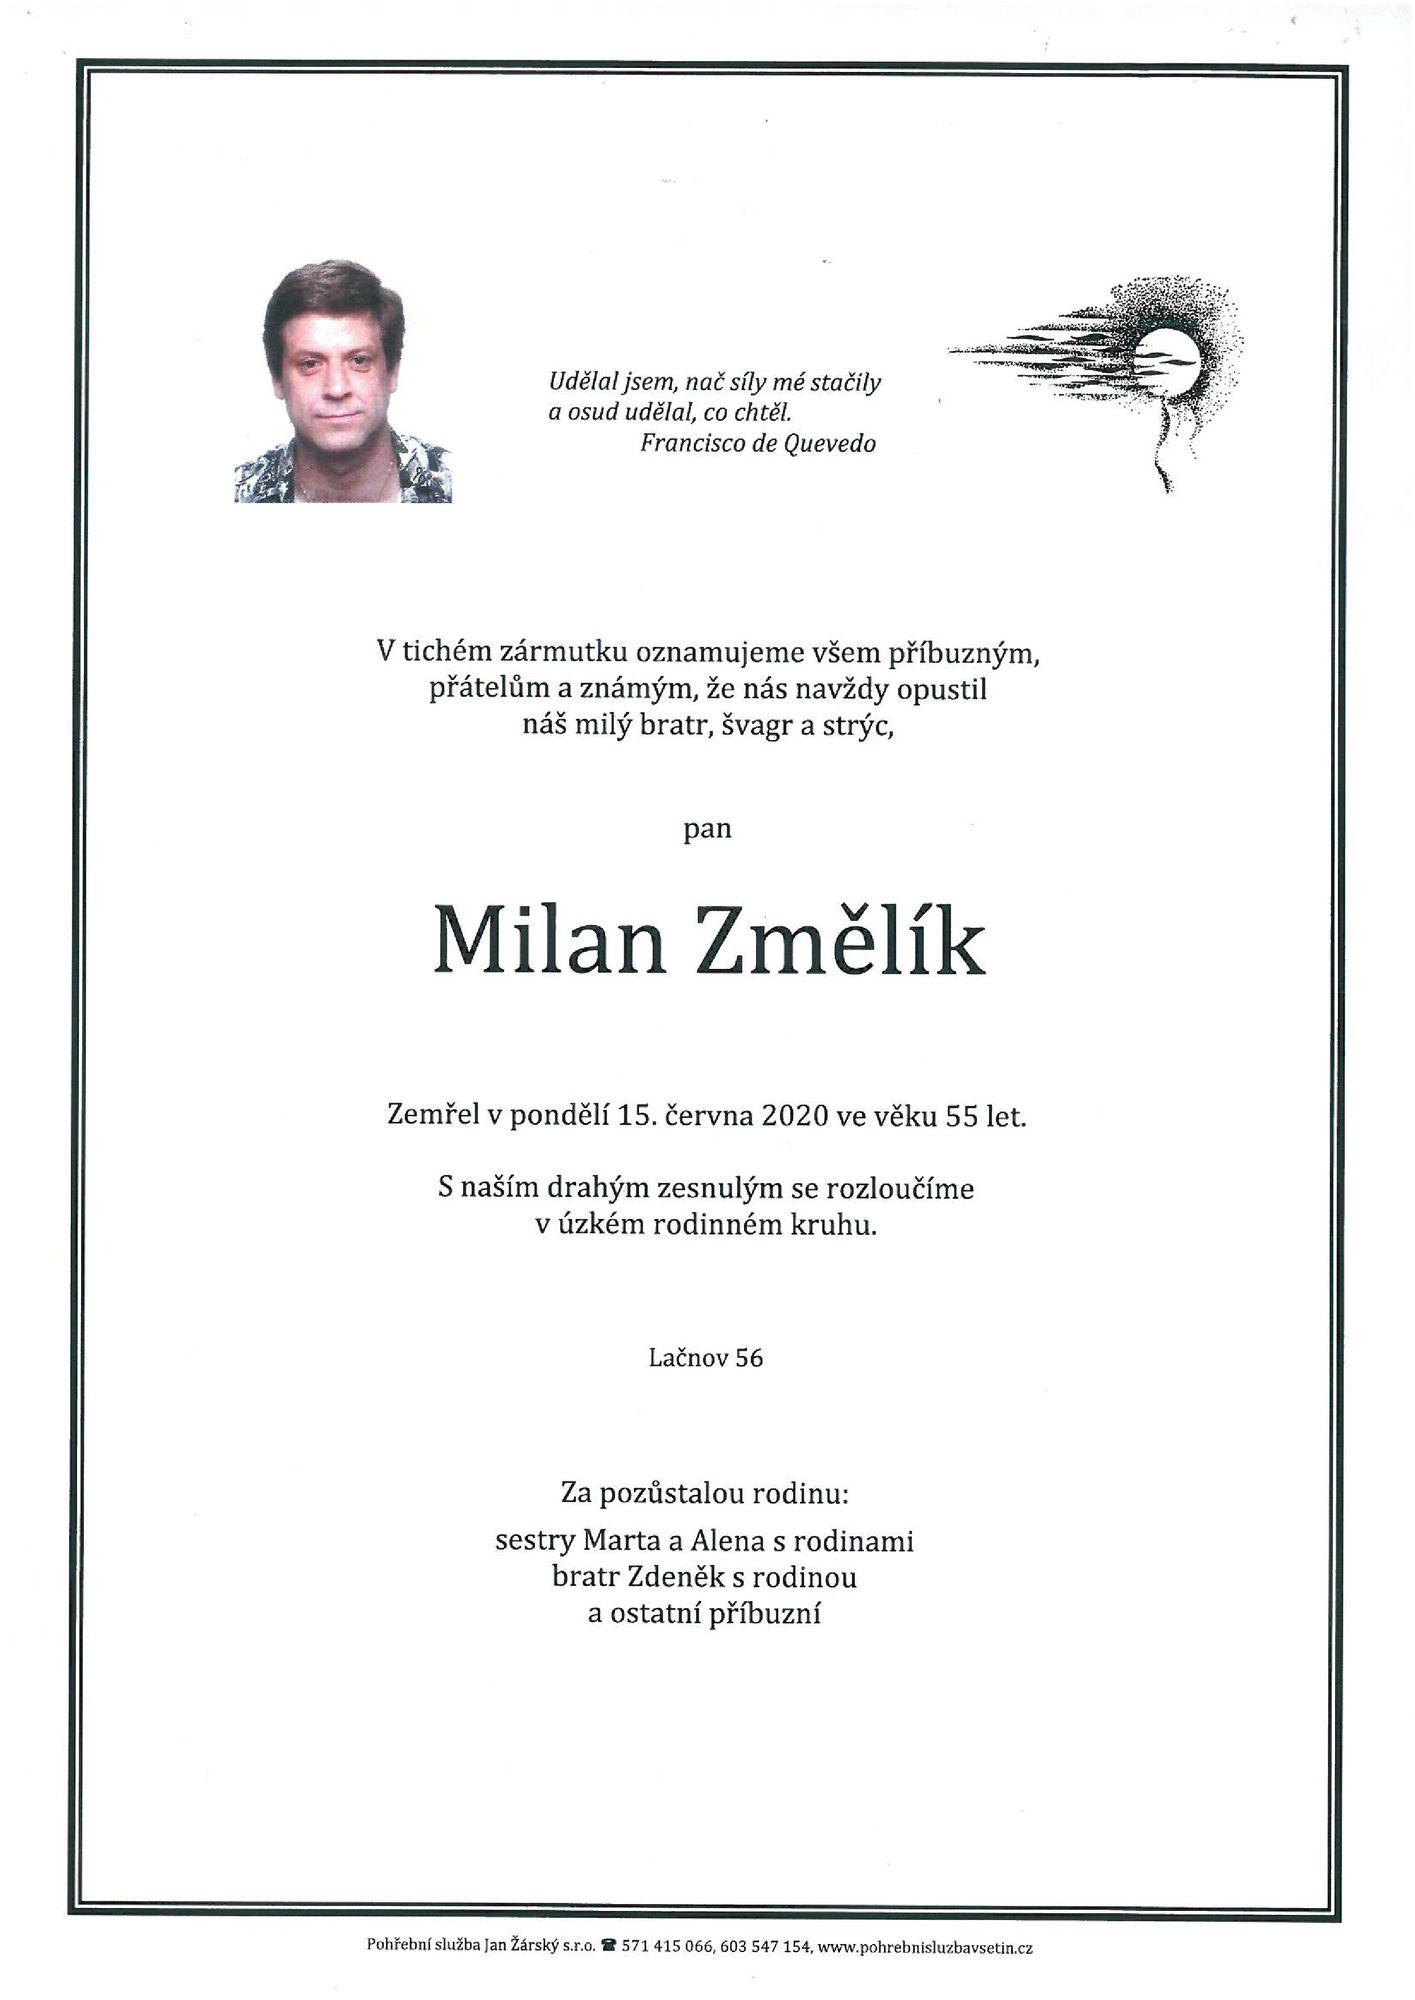 Milan Změlík